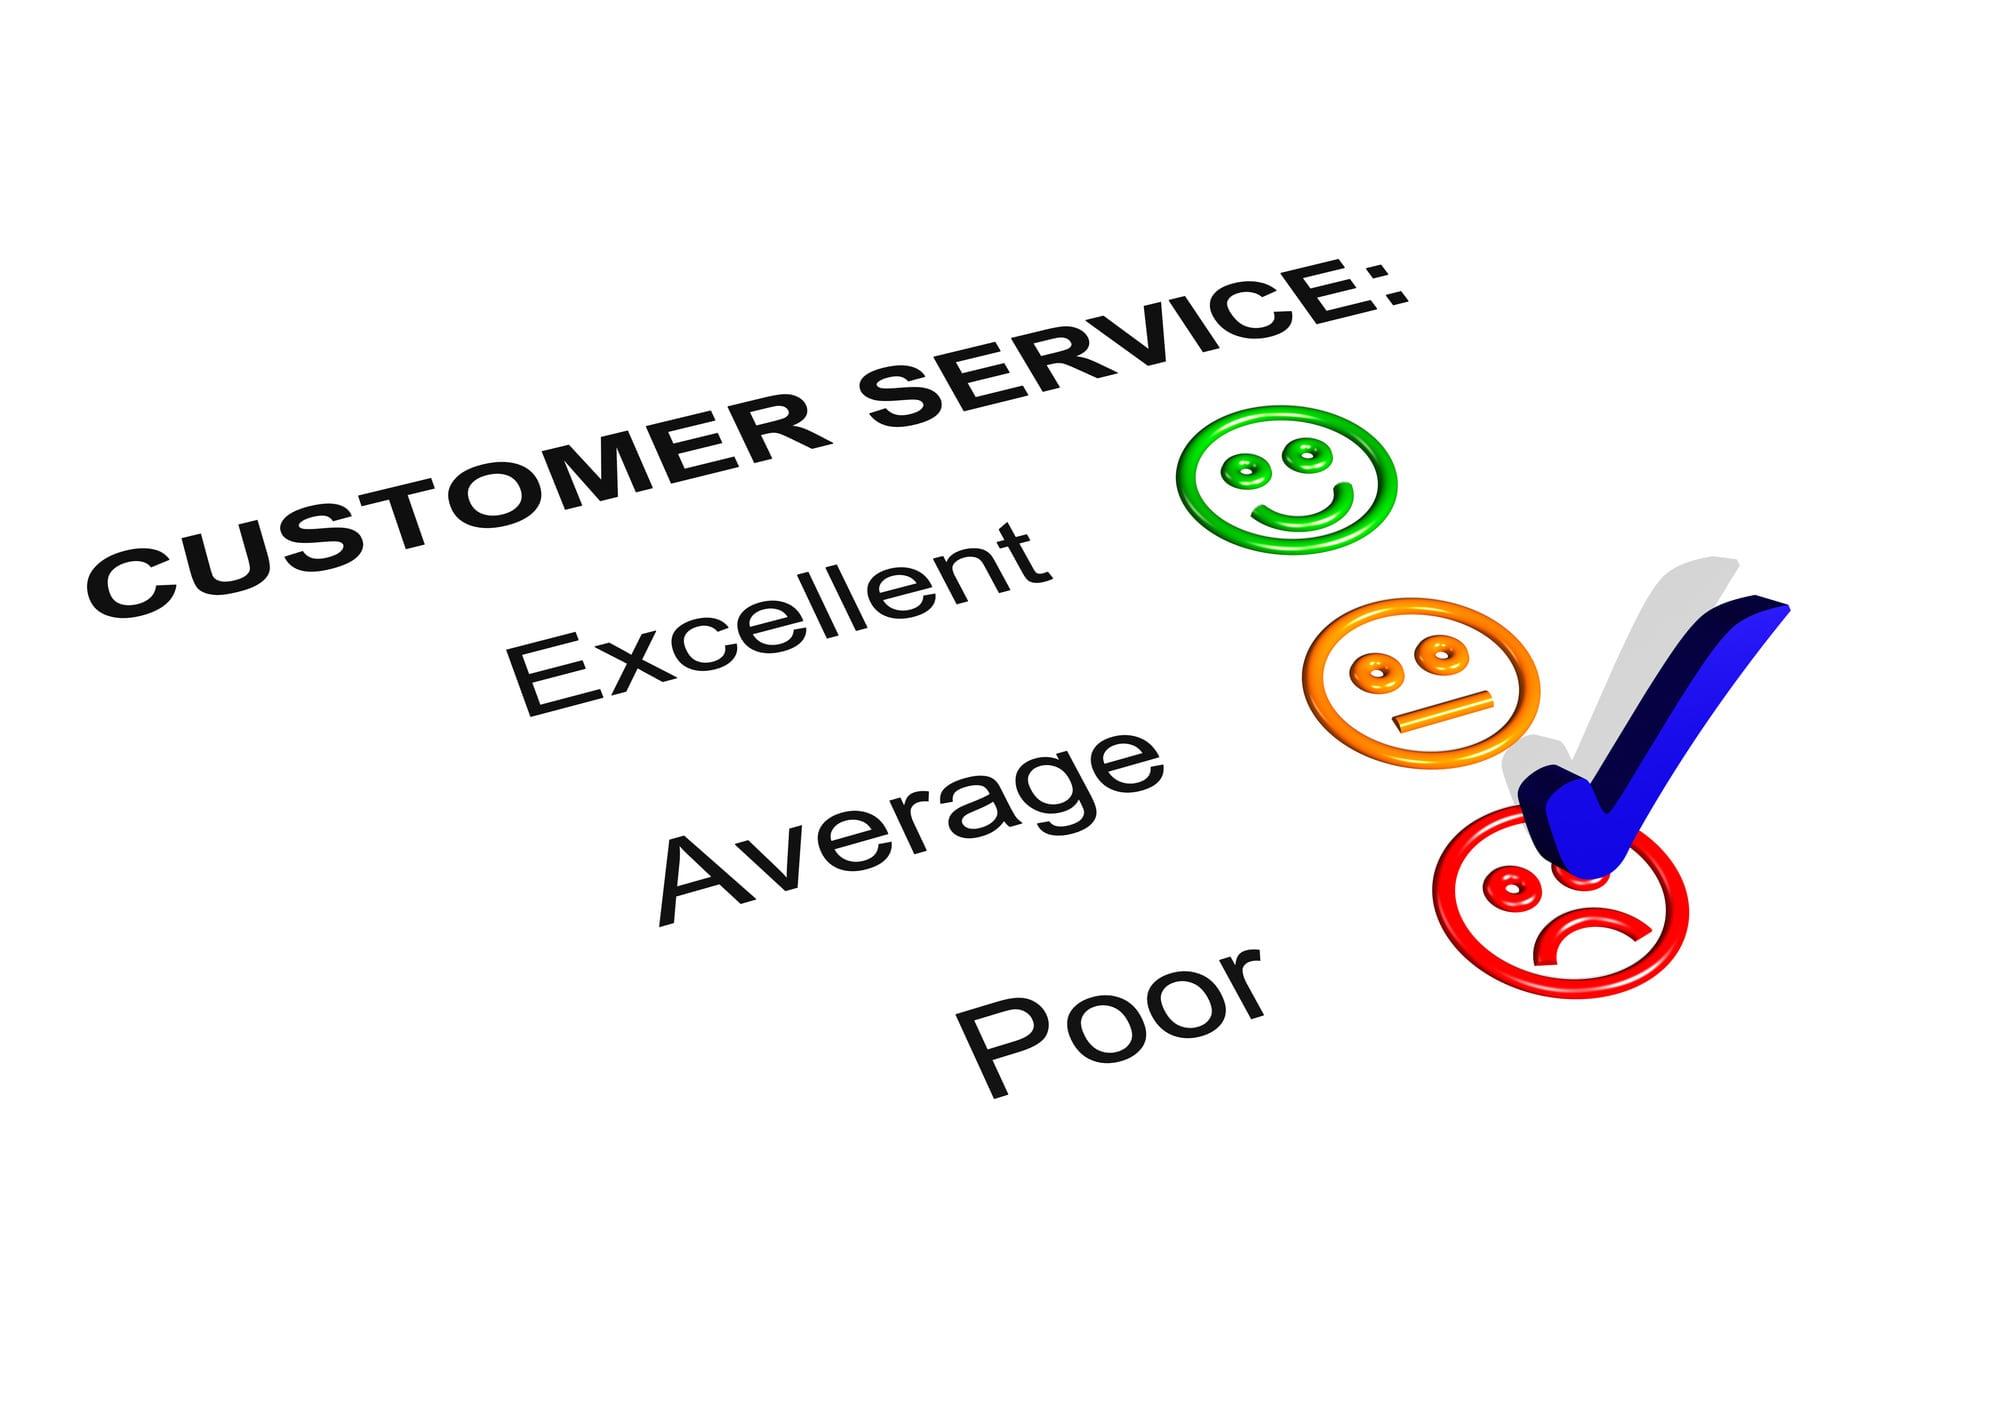 Poor customer service is killing brands